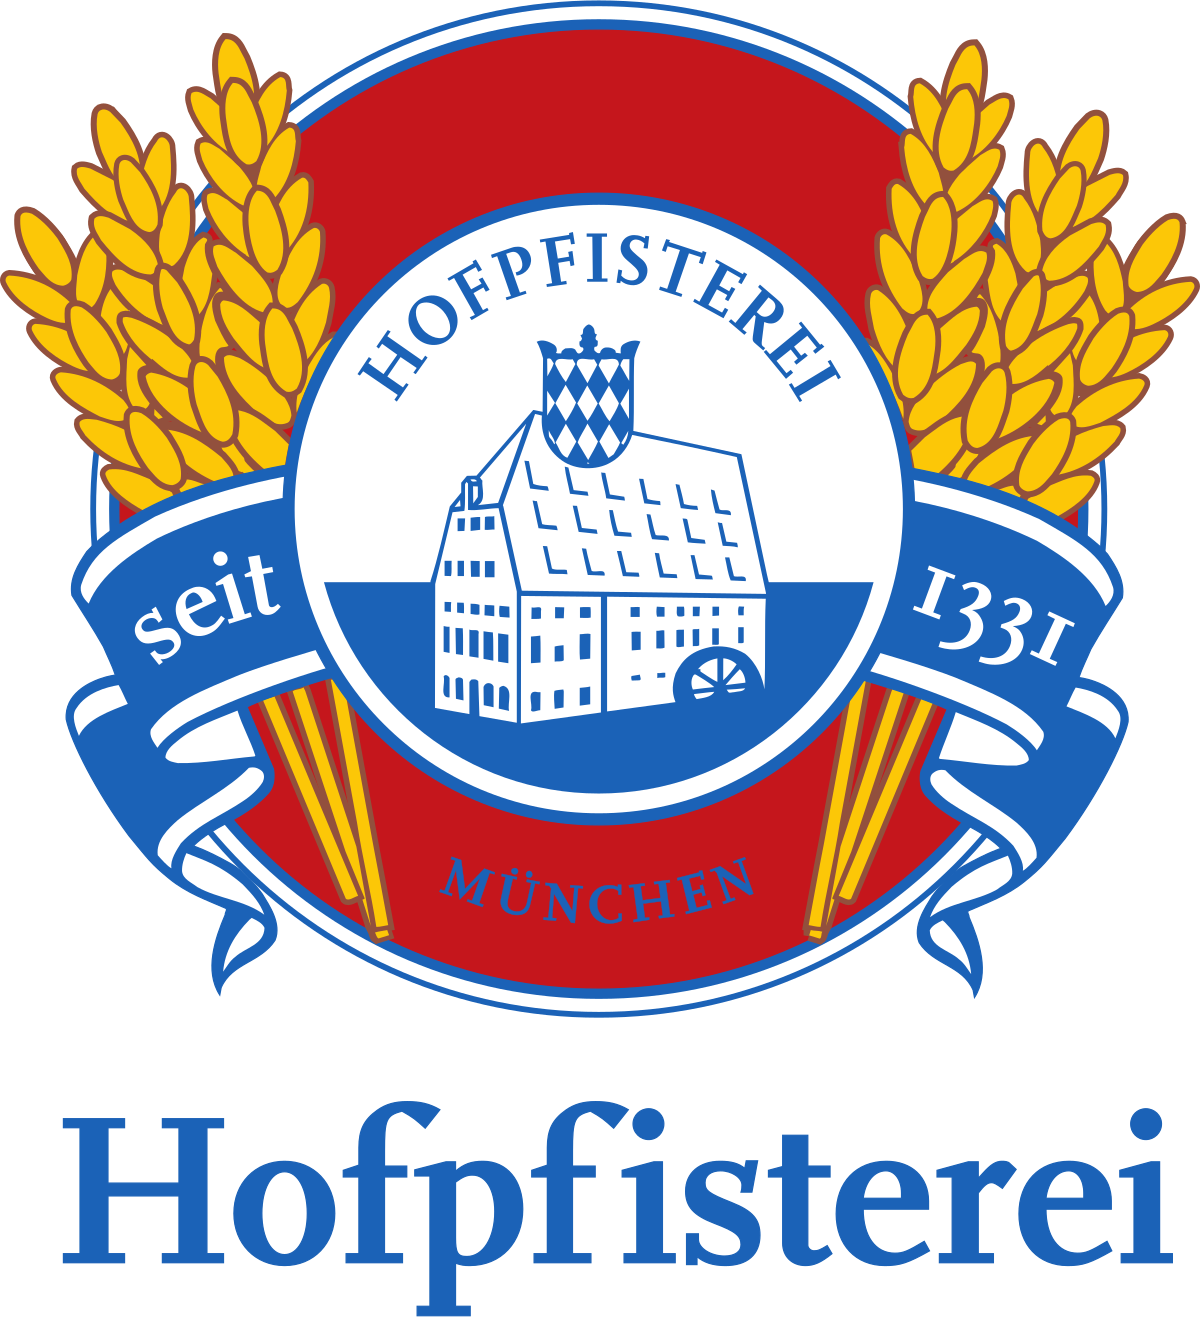 Ludwig Stocker Hofpfisterei GmbH